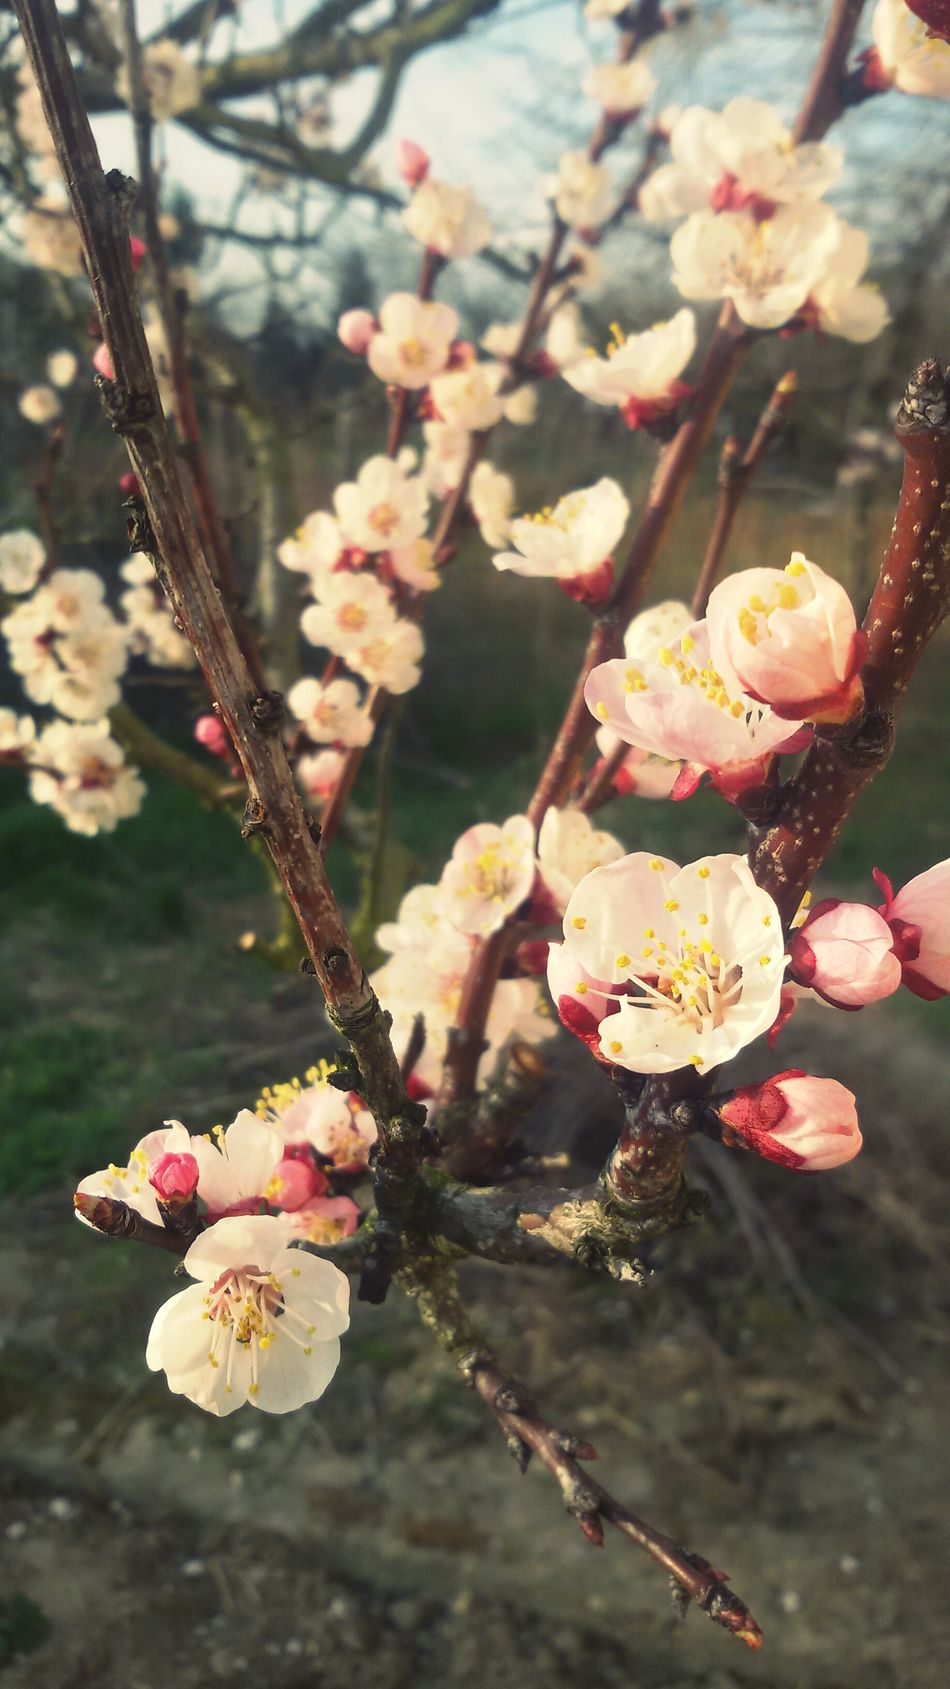 Sour Cherry Cherryflower Cherrytree Flowers White Flowers Spring New Life